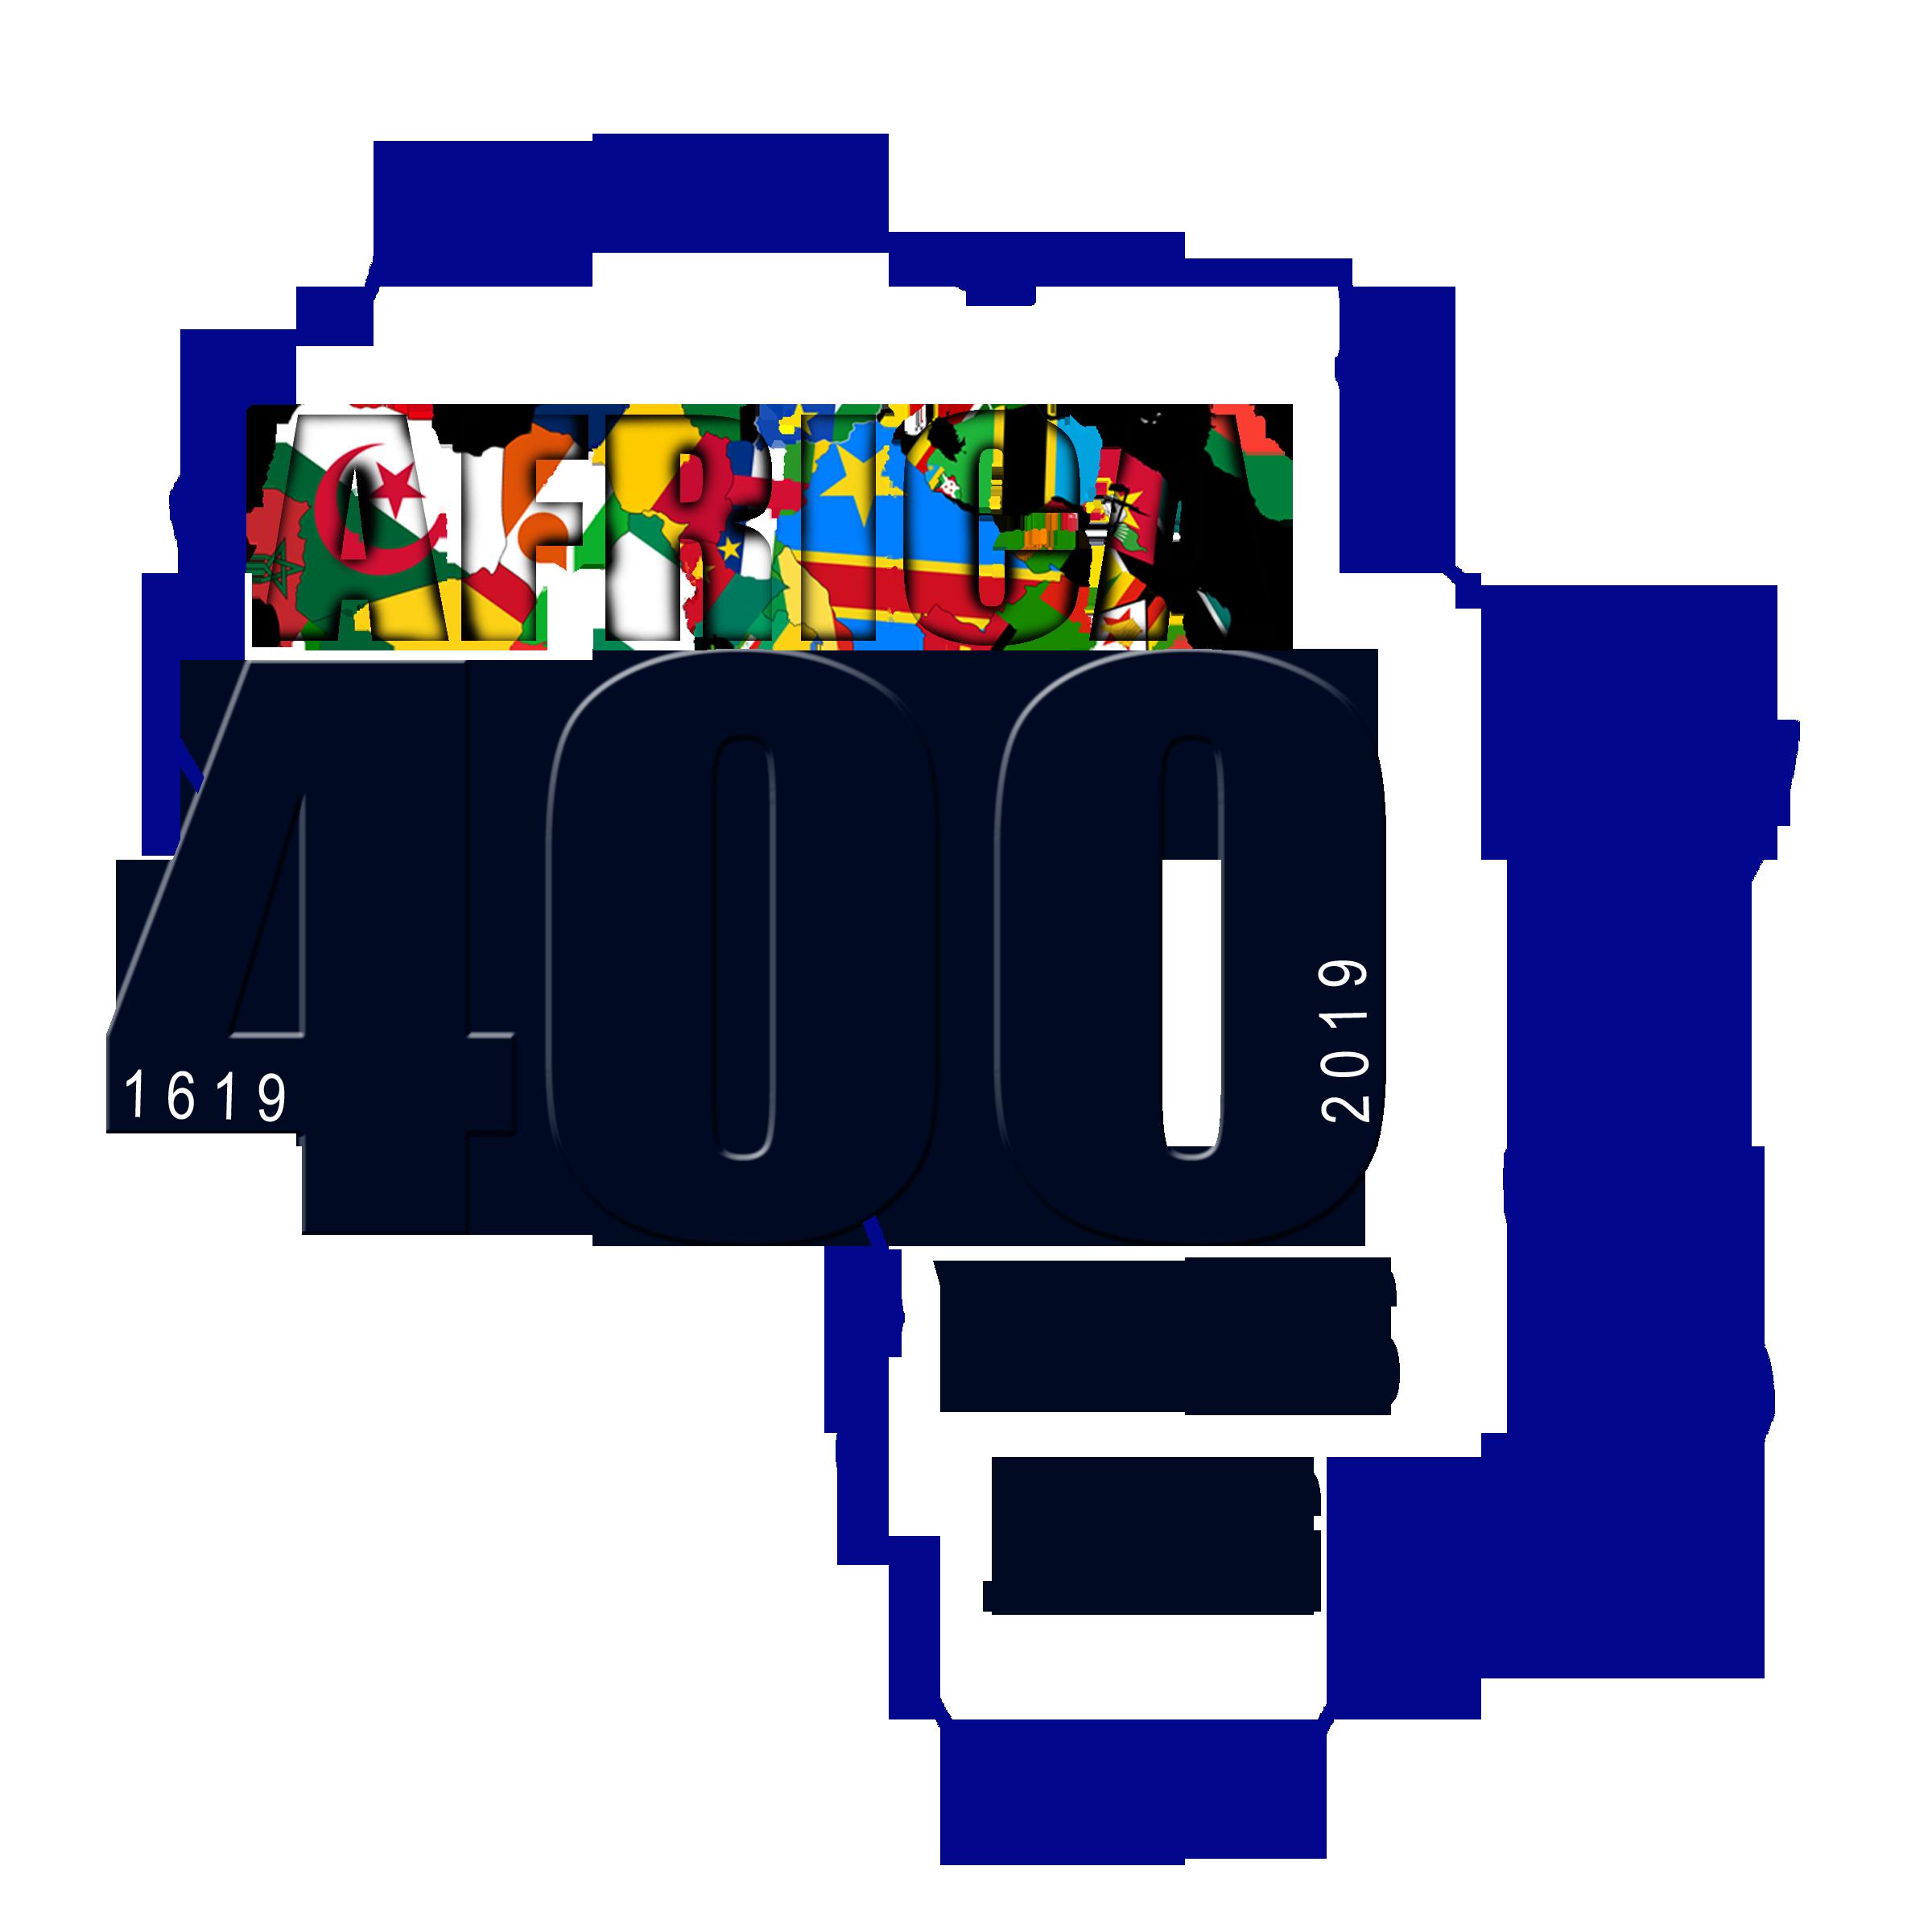 AFRICA 400 YEARS LOGO